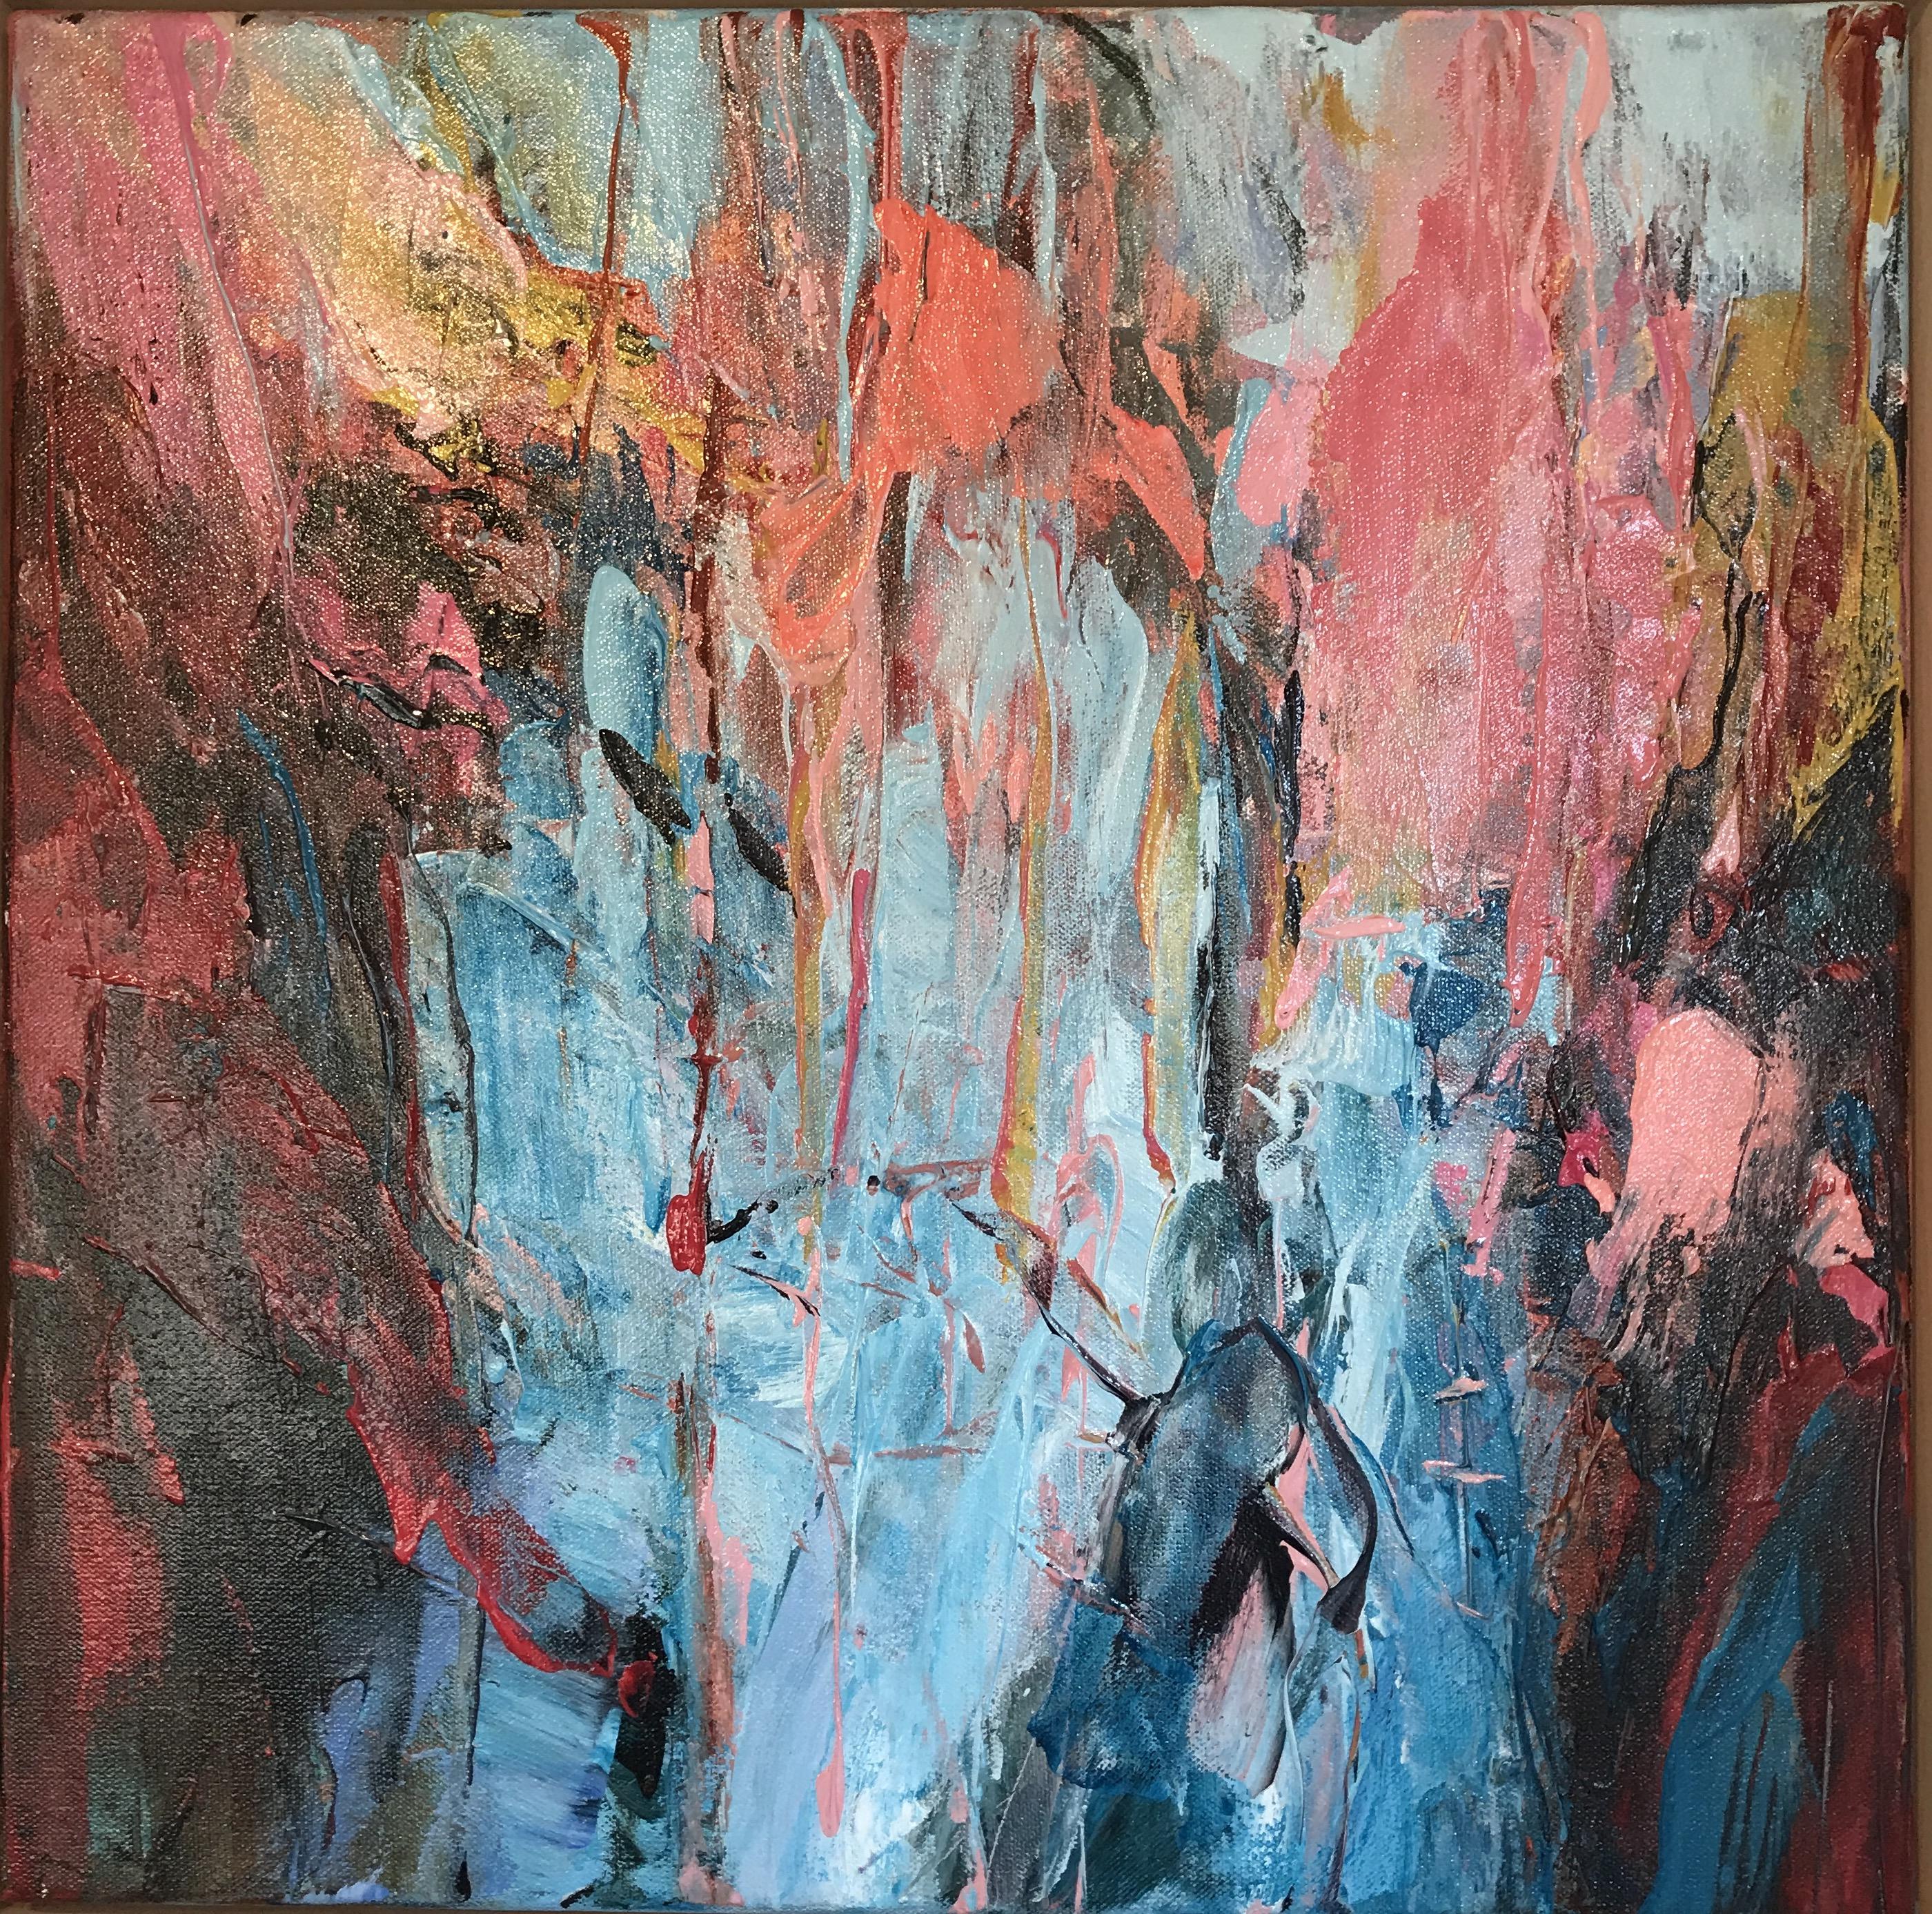 JUROR'S TALK - with Abstract artist Connie Connally 10/01/2017